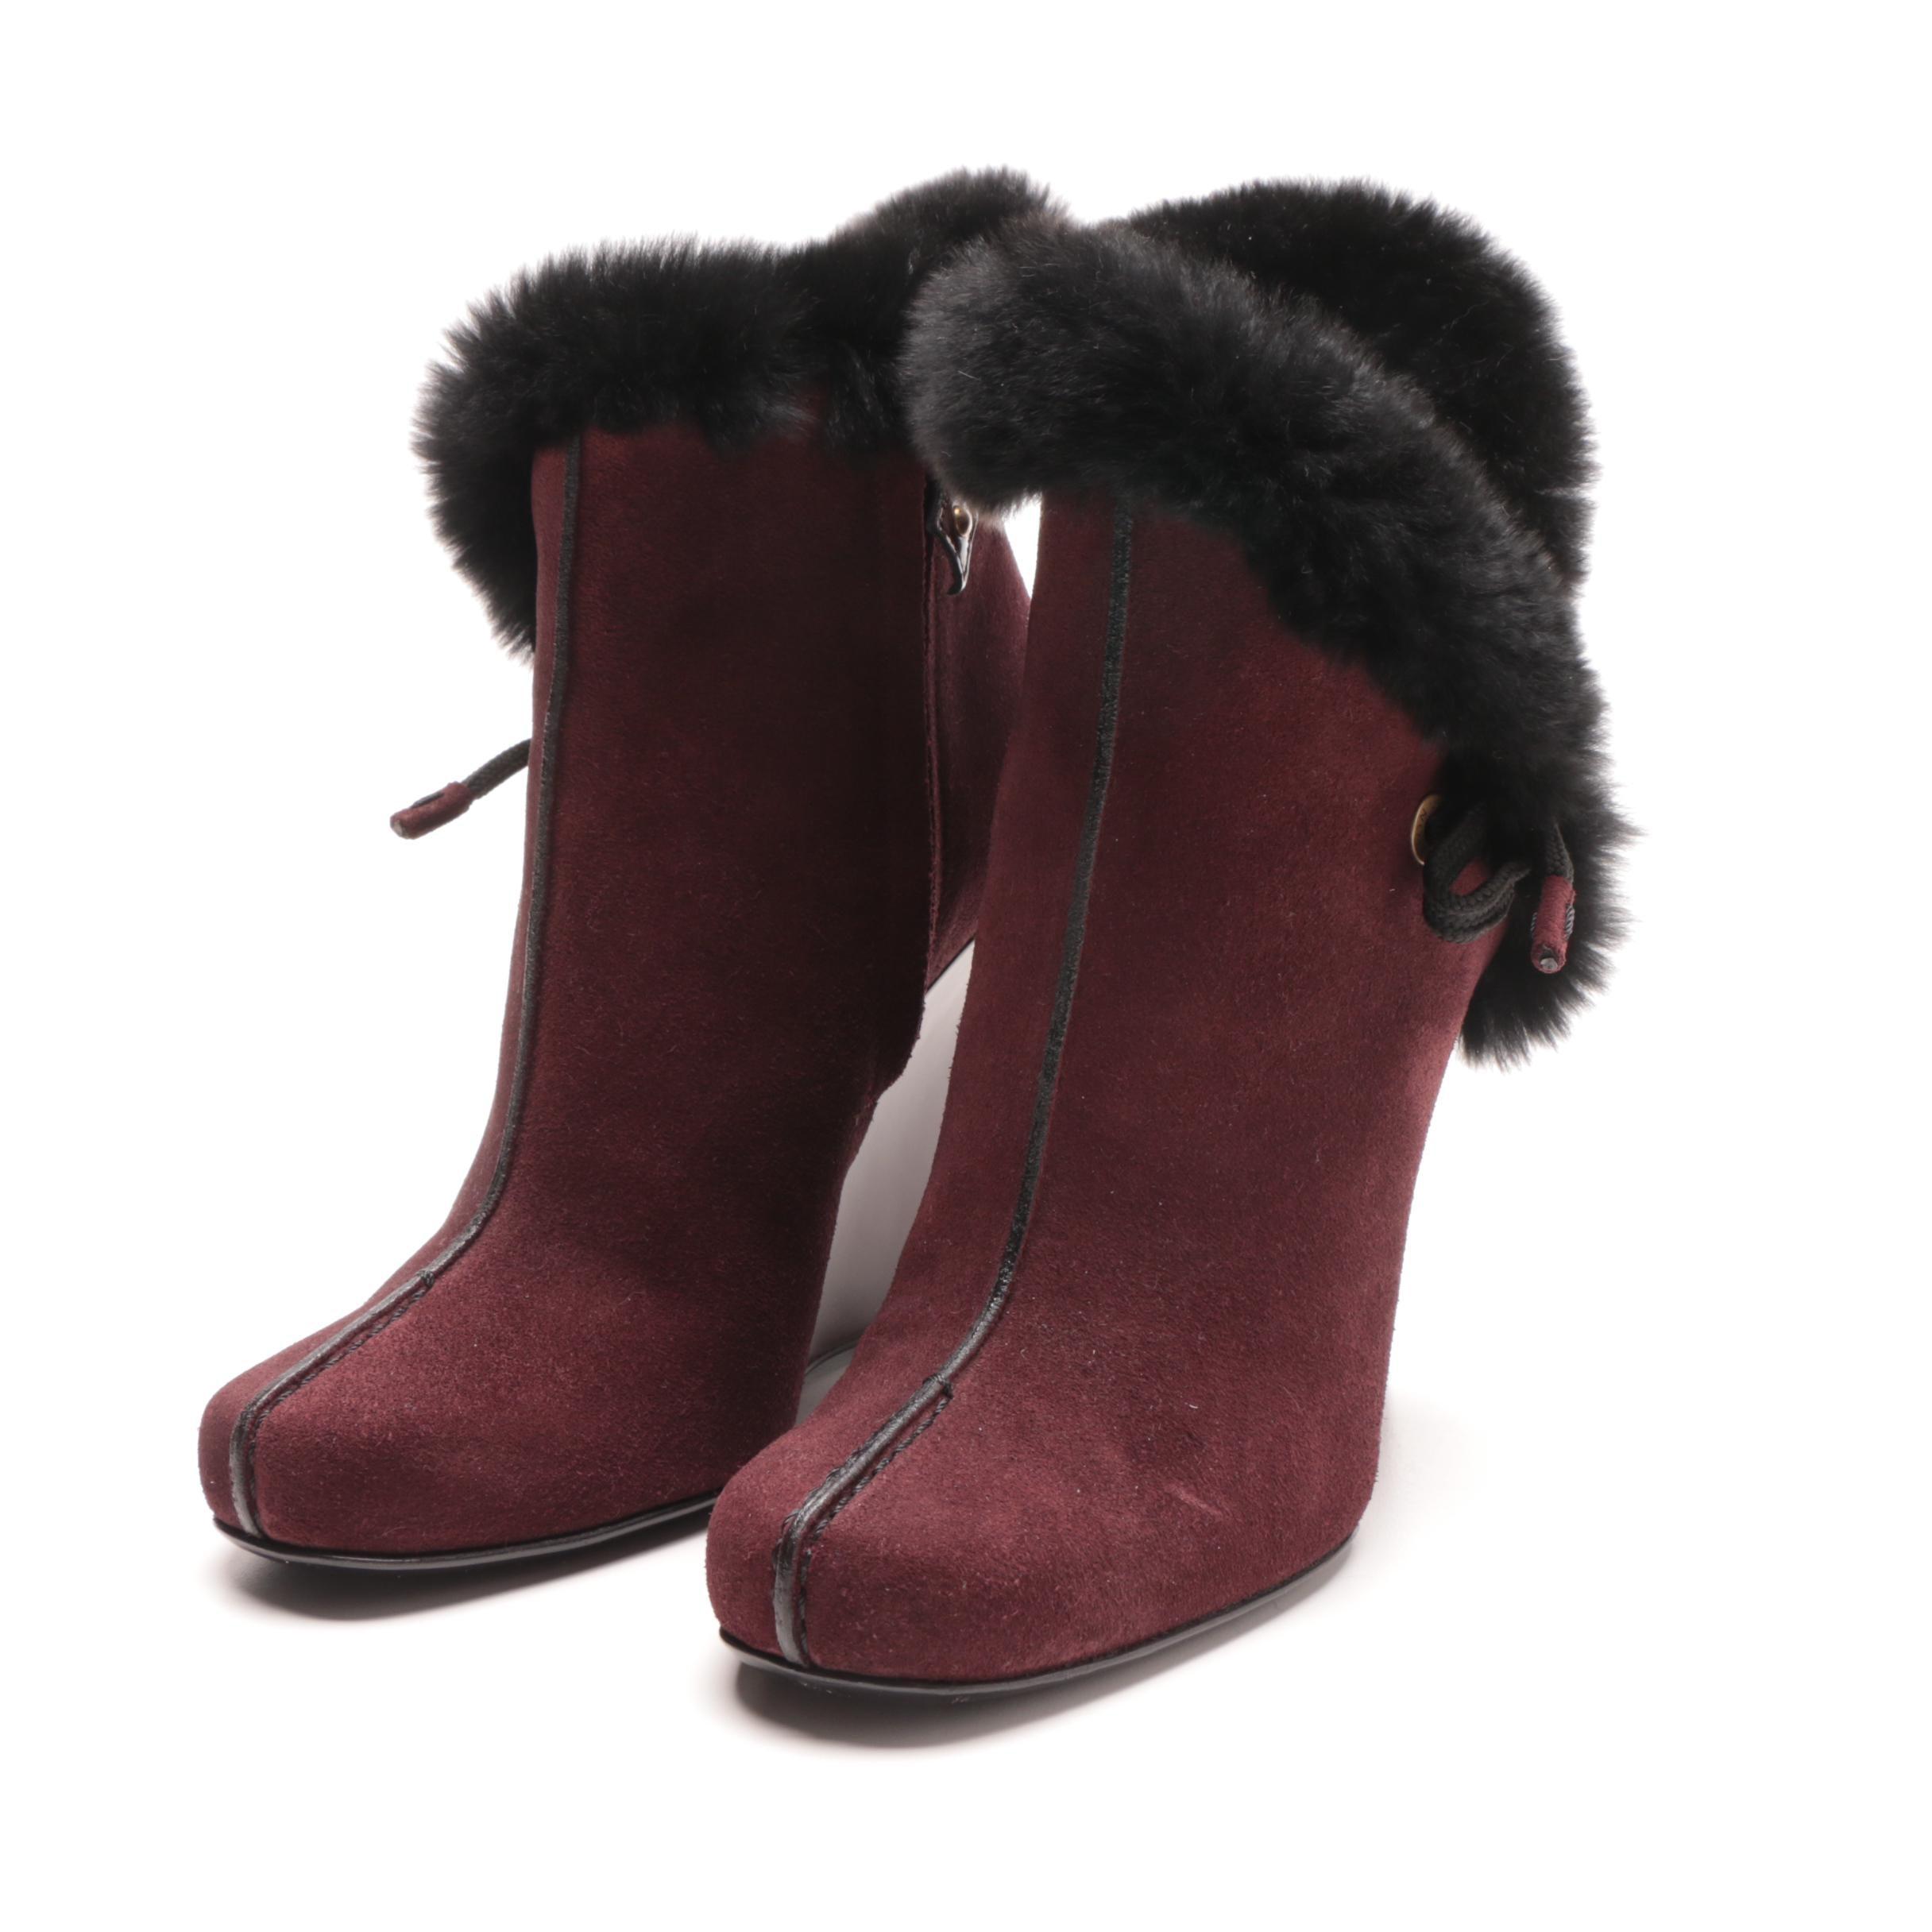 Louis Vuitton Brown Suede Fur Trimmed Wedge Booties